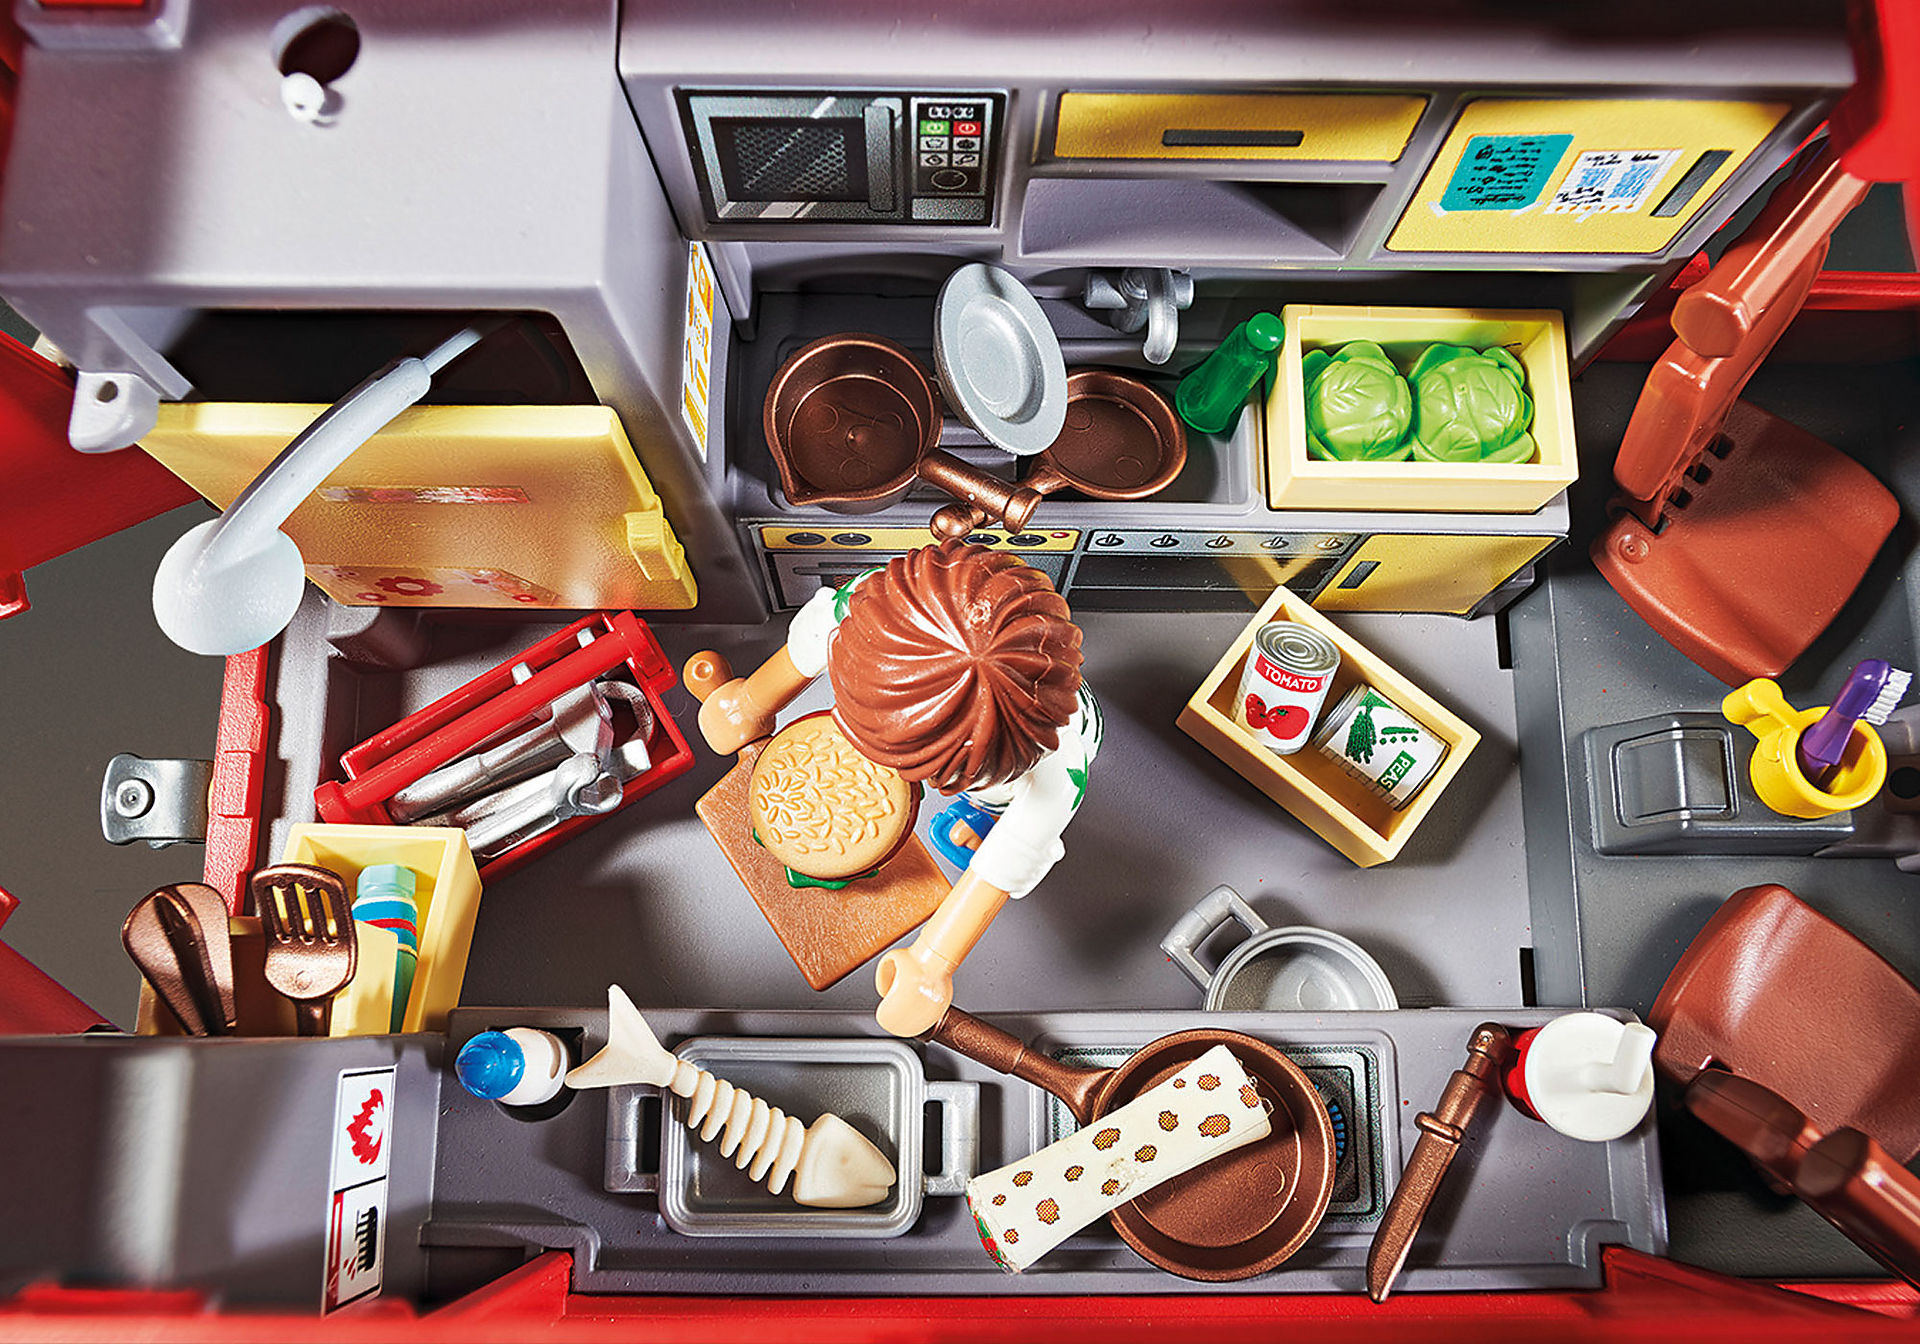 http://media.playmobil.com/i/playmobil/70075_product_extra1/PLAYMOBIL:THE MOVIE Del's Food Truck